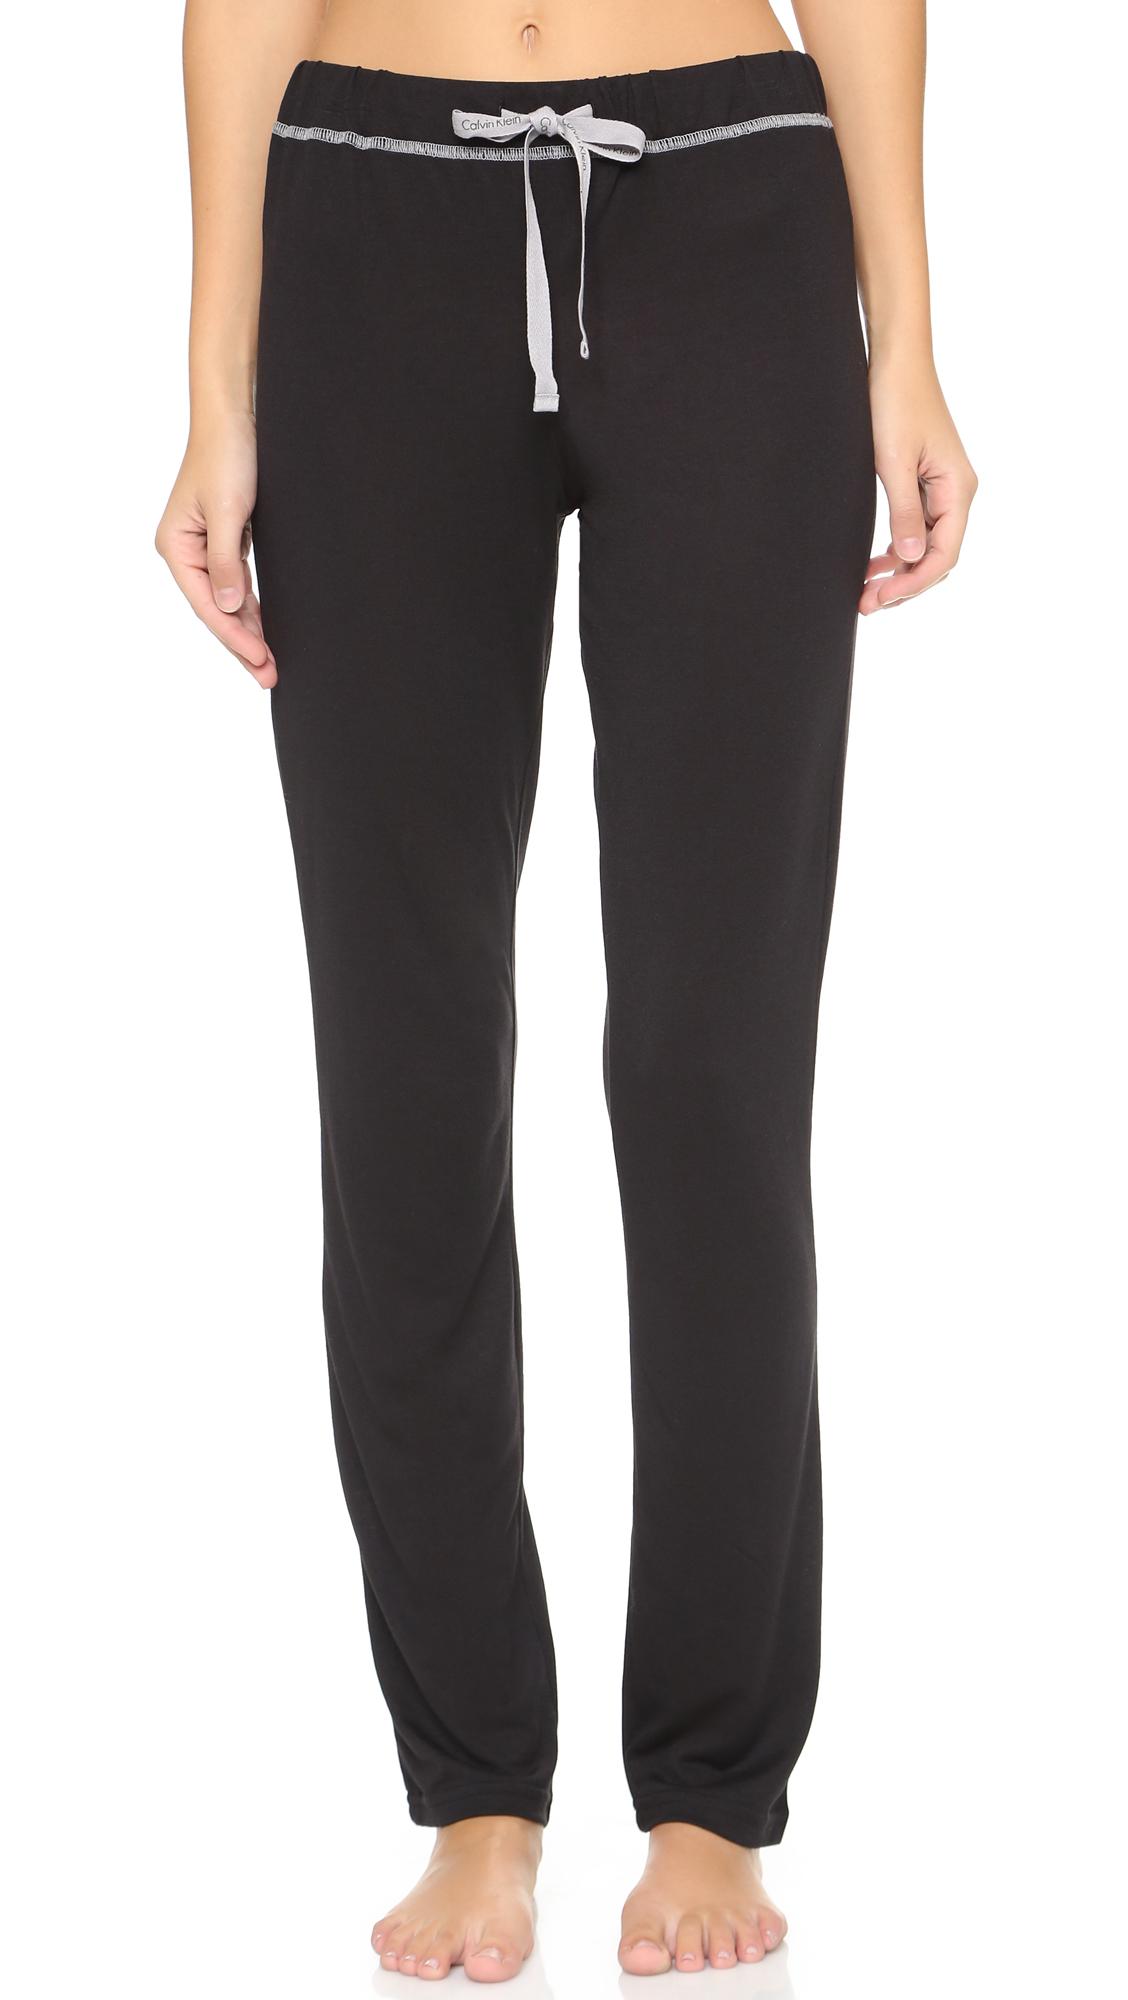 detailing united kingdom purchase cheap Calvin Klein Underwear Liquid Lounge Pajama Pants | SHOPBOP